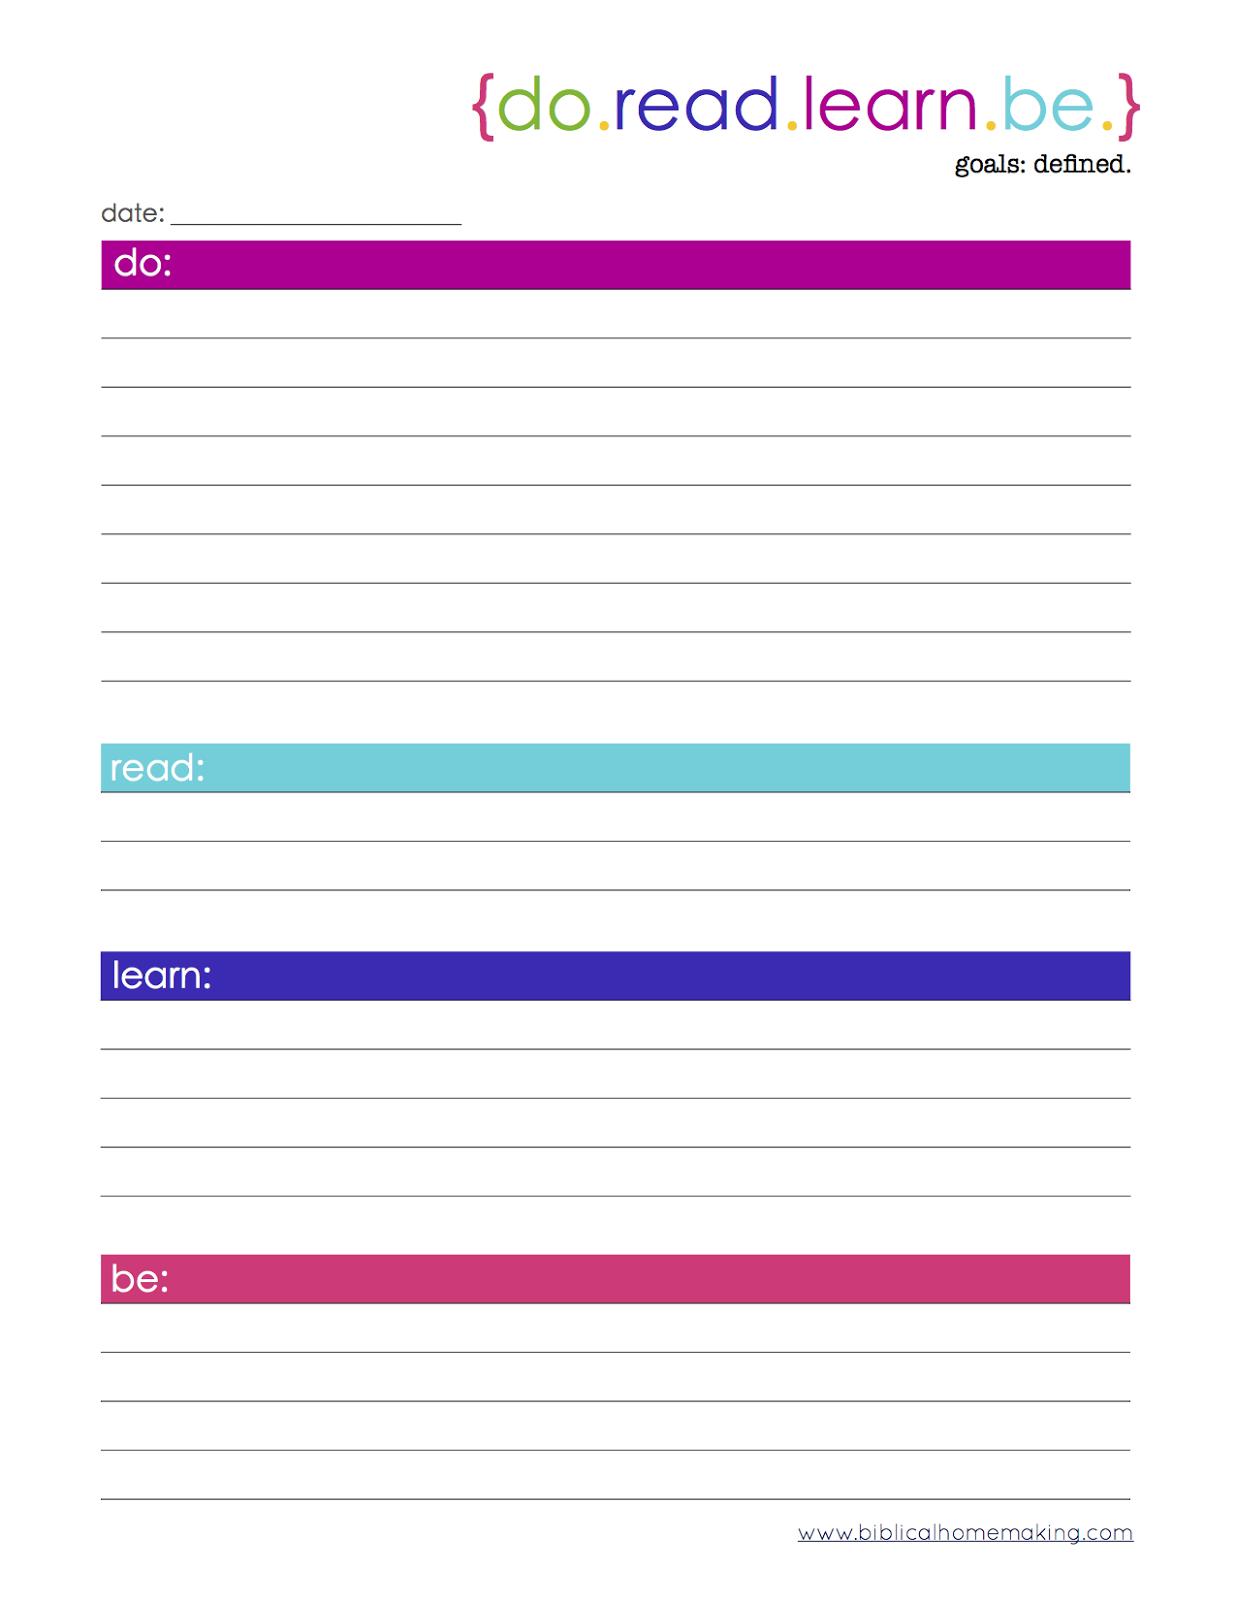 Worksheets Free Printable Goal Setting Worksheets 6 best images of free printable goals worksheet goal setting worksheets